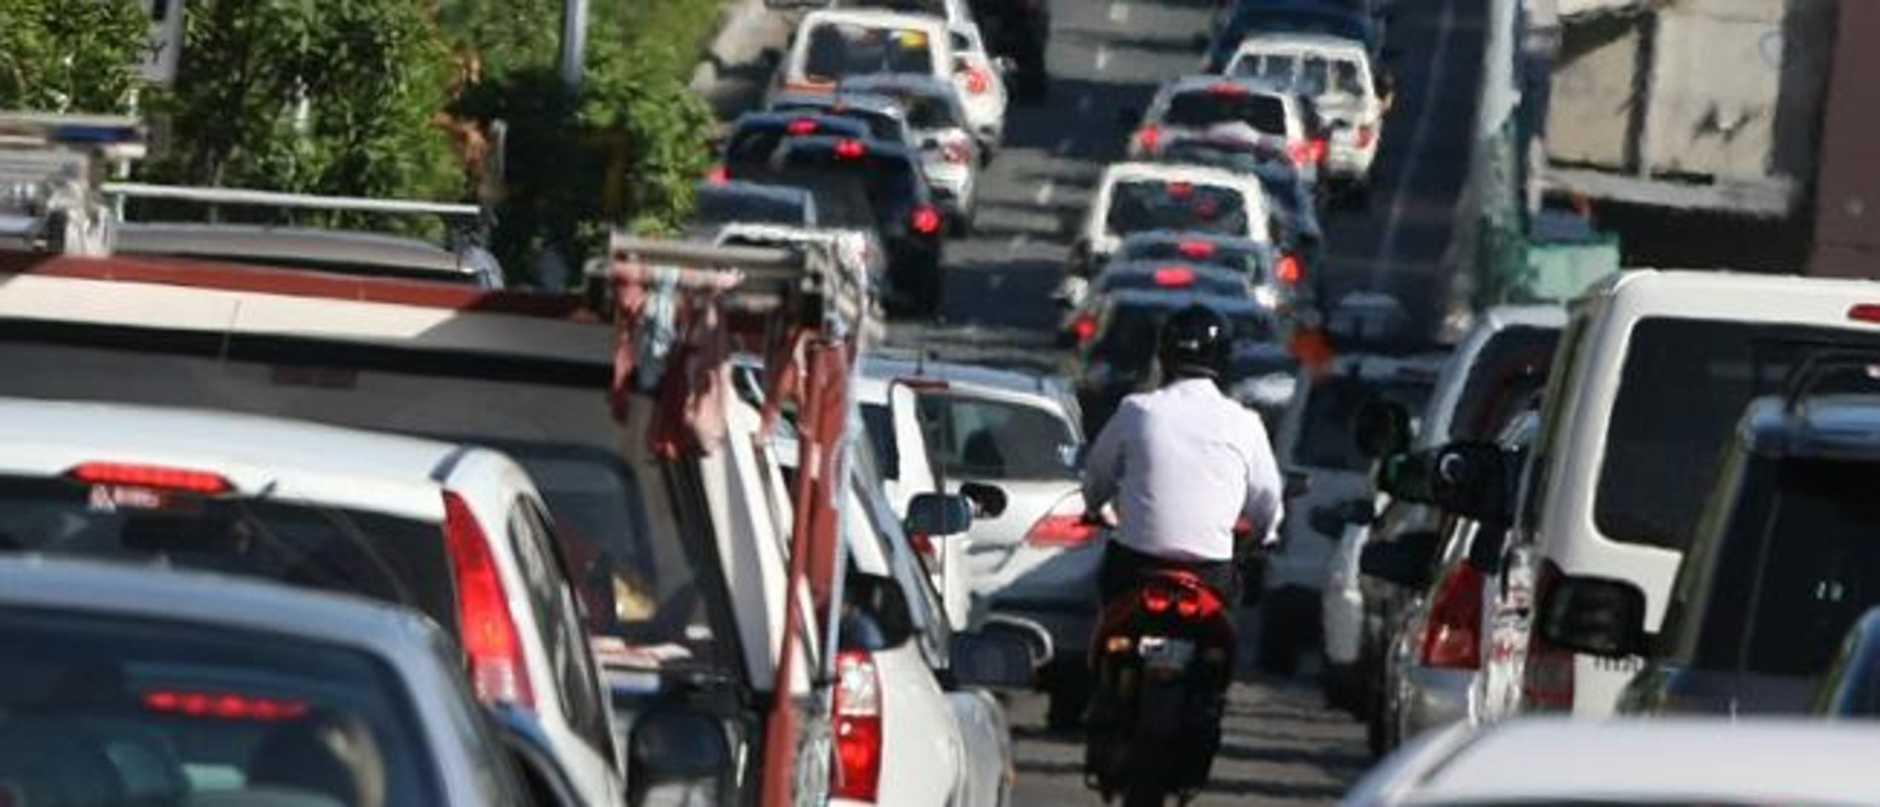 Brisbane traffic: Serious Bruce Highway crash causes major delays